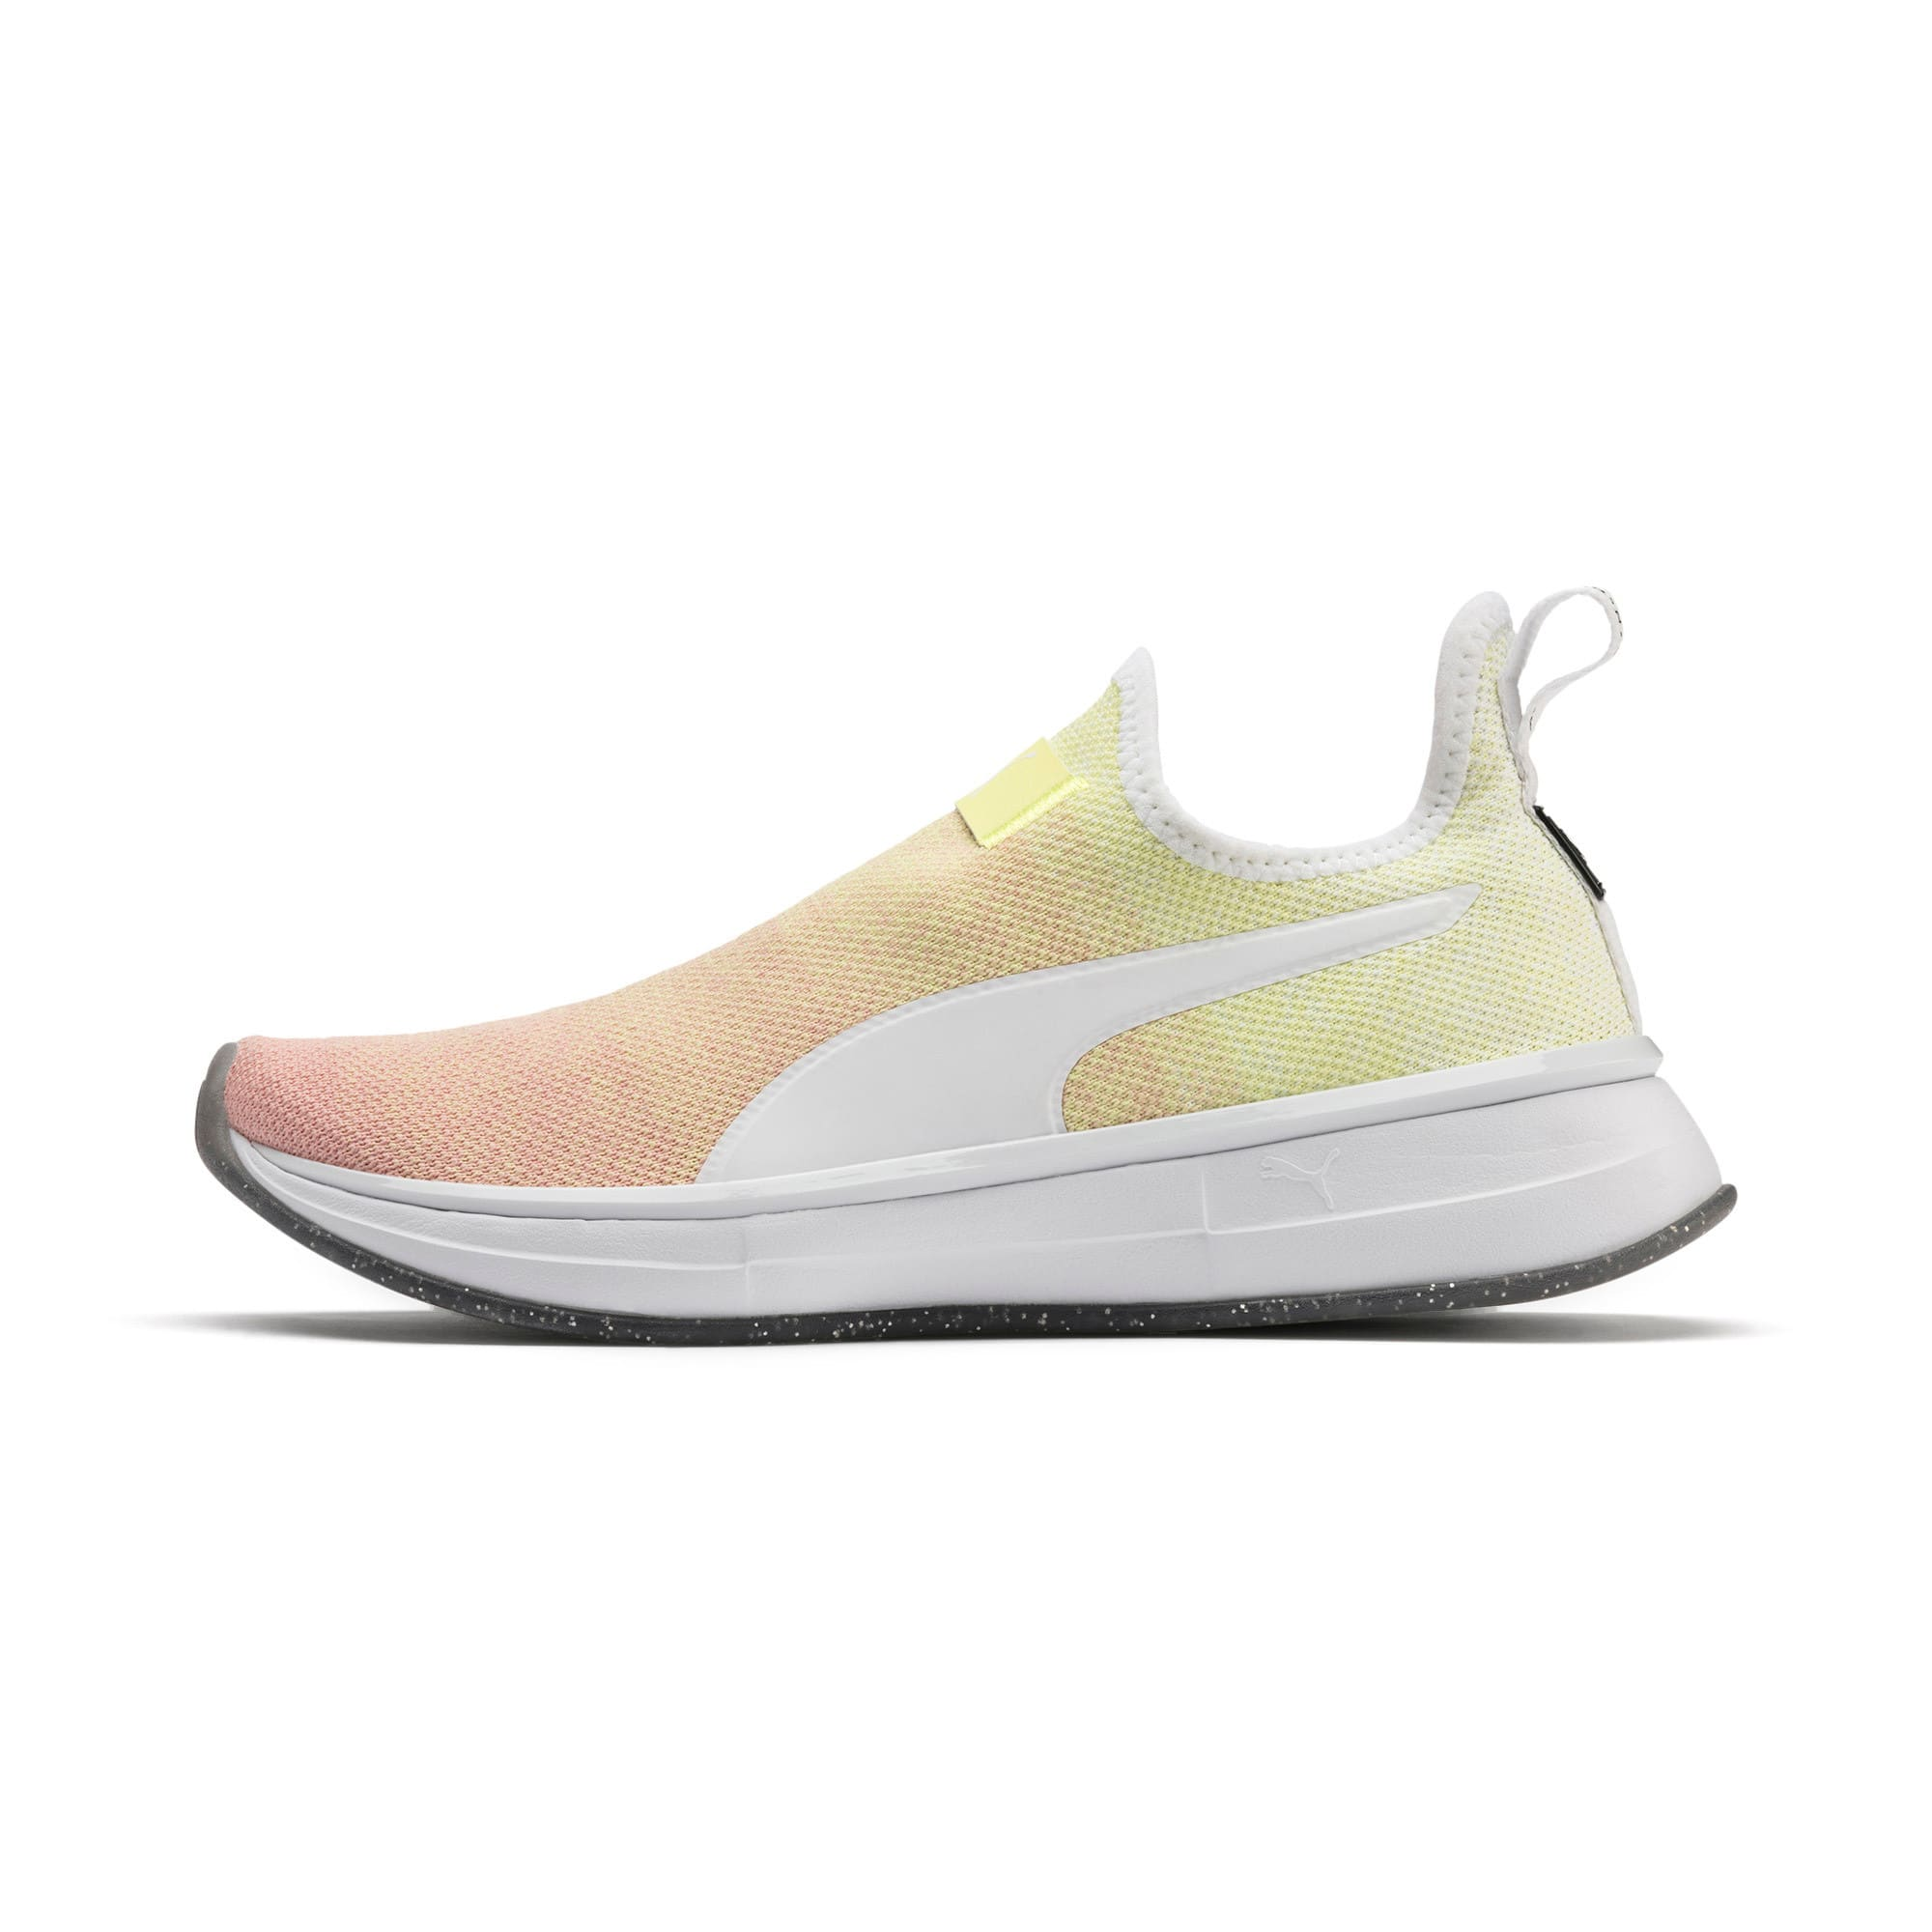 Miniatura 1 de Zapatos de entrenamiento SG Slip-On Sunrise para mujer, YELLOW-Peach Bud-White, mediano